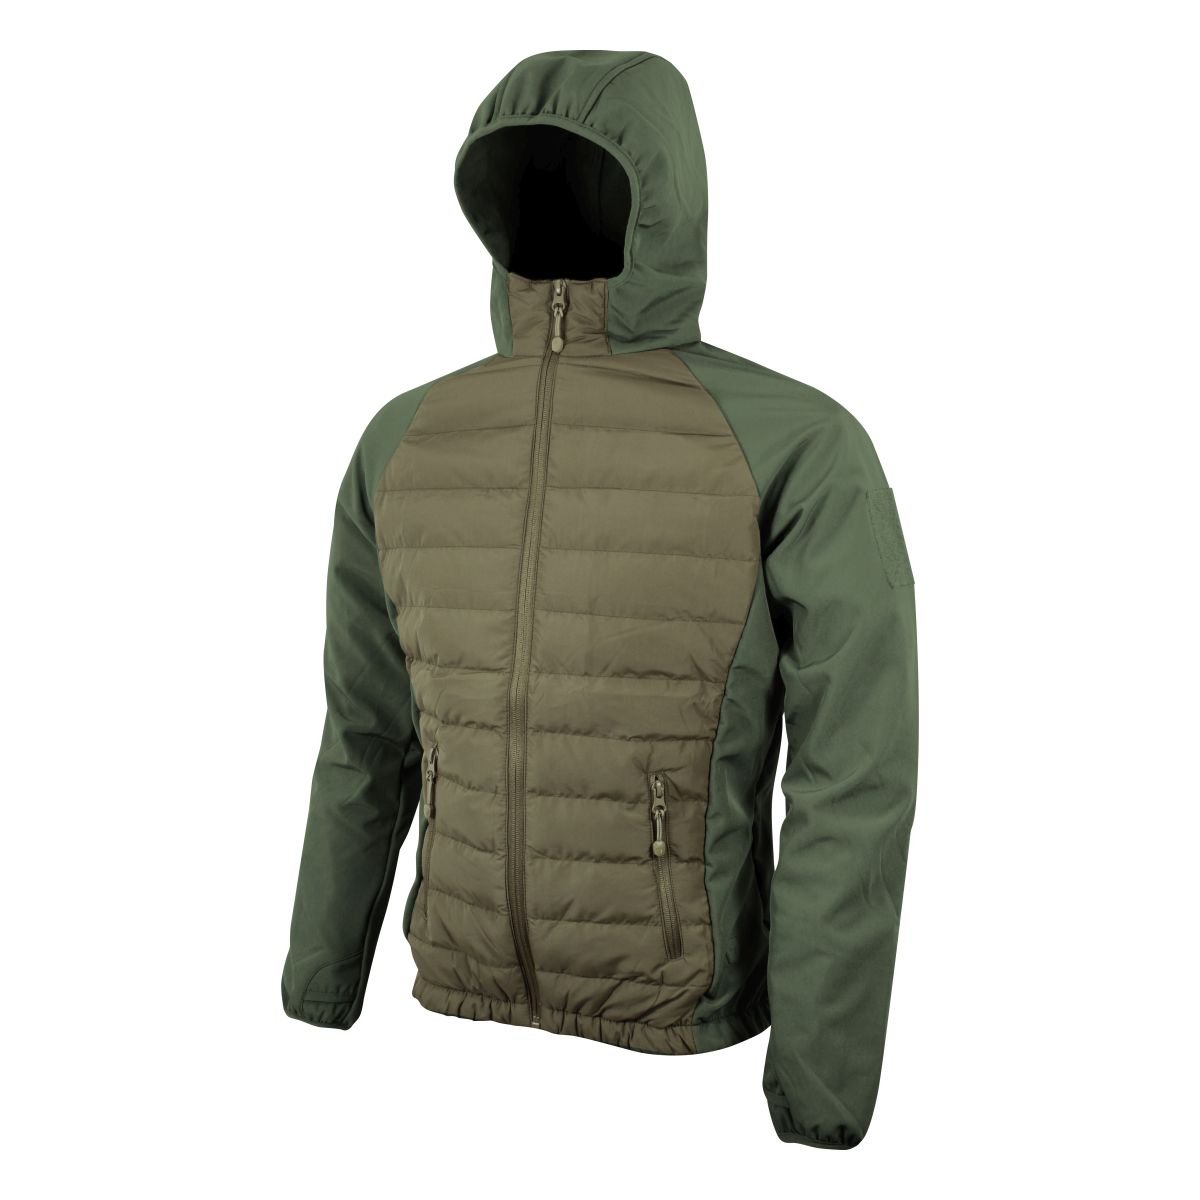 Bunda SNEAKER softshell/fleece ZELENÁ Viper® VJKTSNG L-11